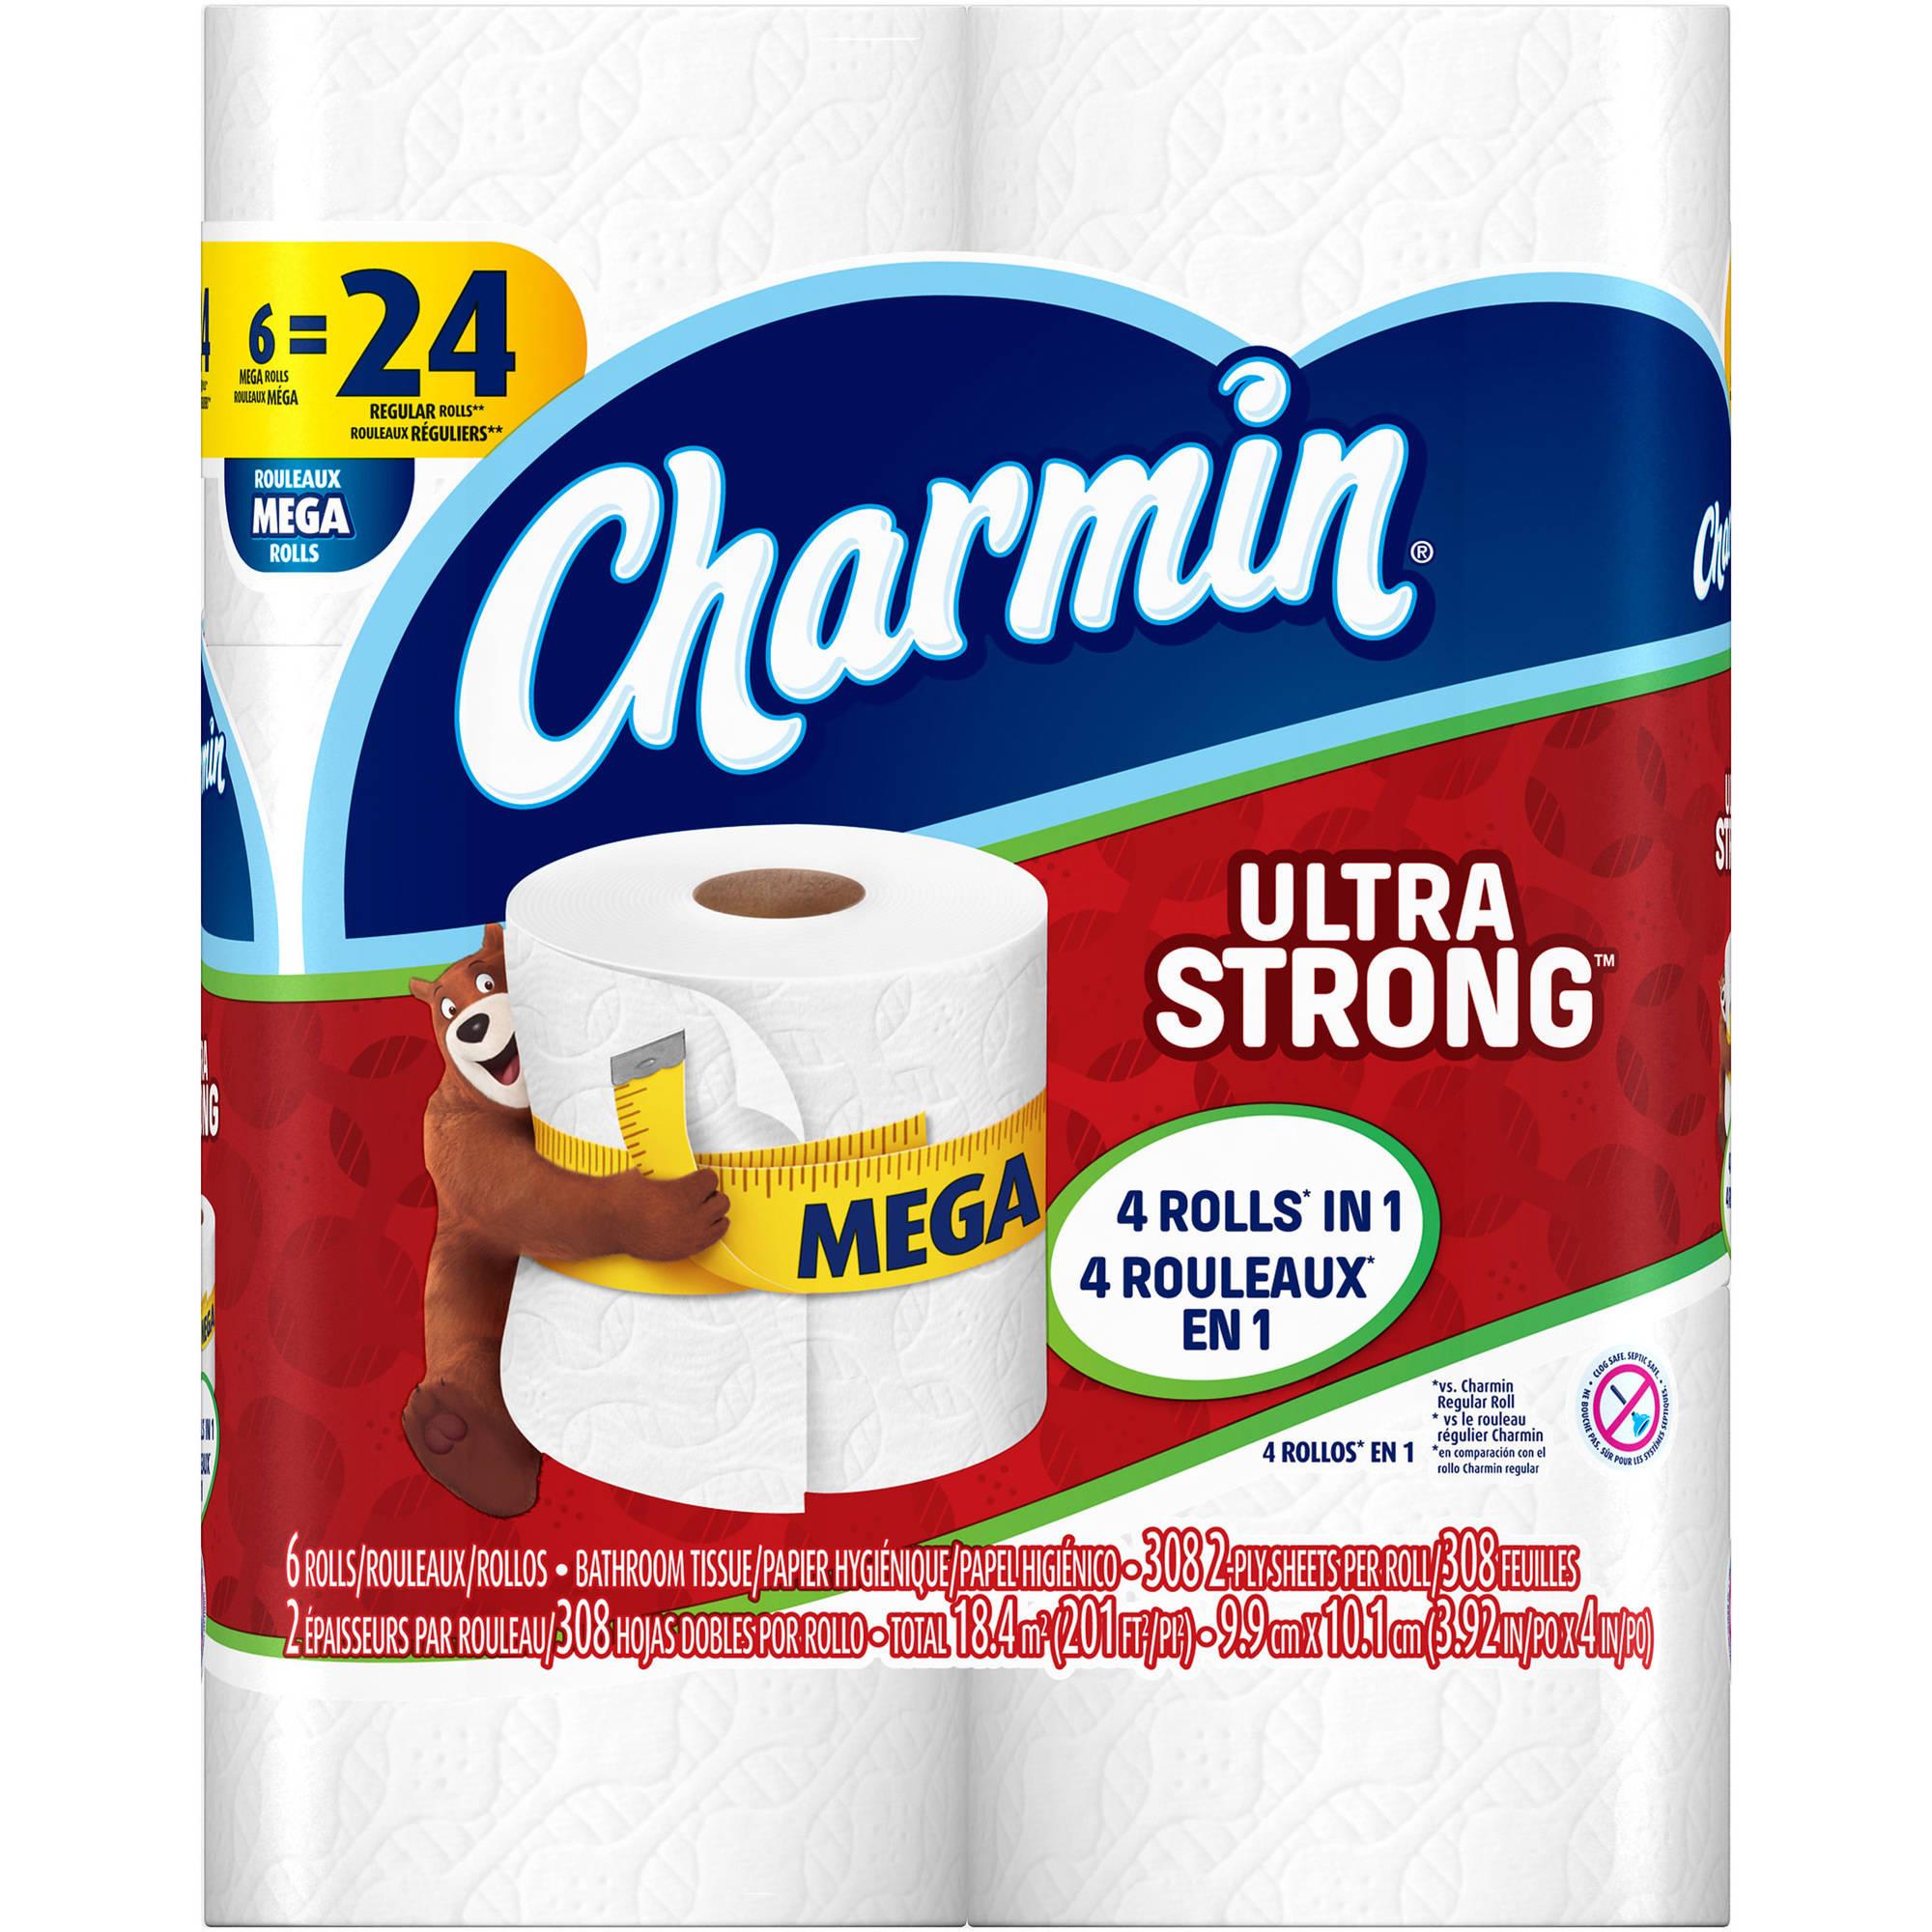 Charmin Ultra Strong Toilet Paper Mega Rolls, 308 sheets, 6 rolls